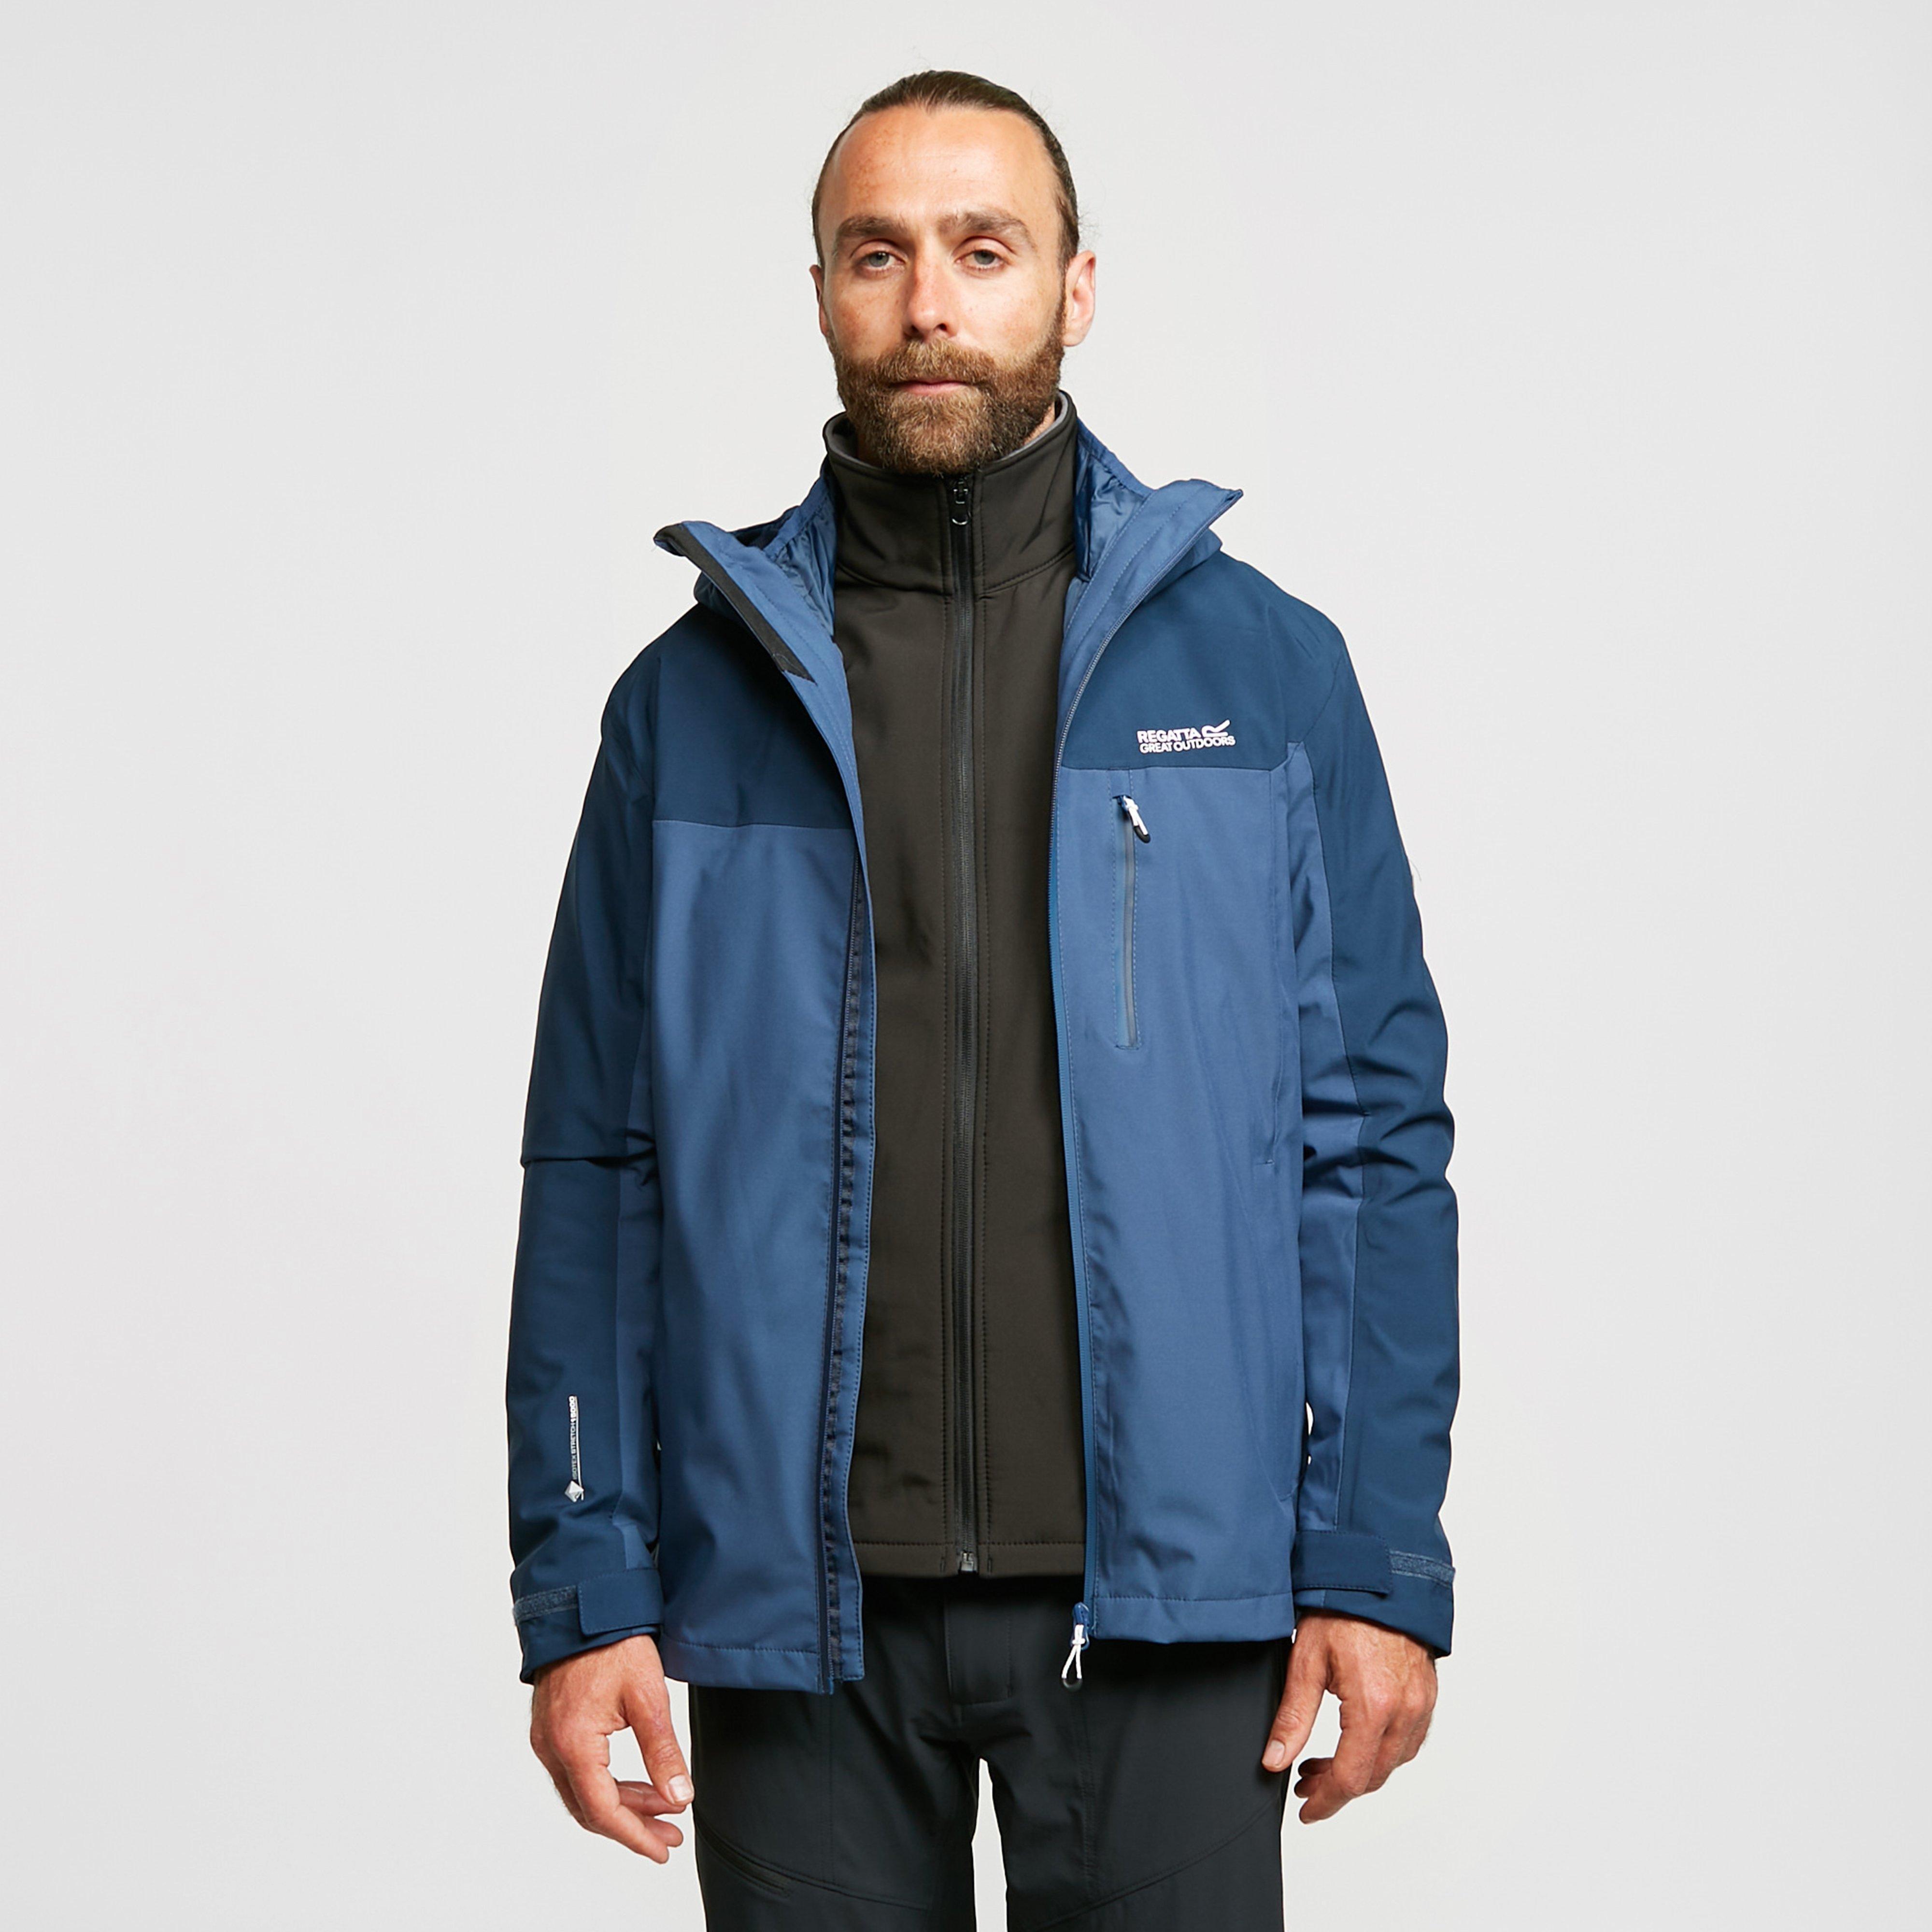 Regatta Men's Wentwood Iv 3-In-1 Jacket - Blue, Blue